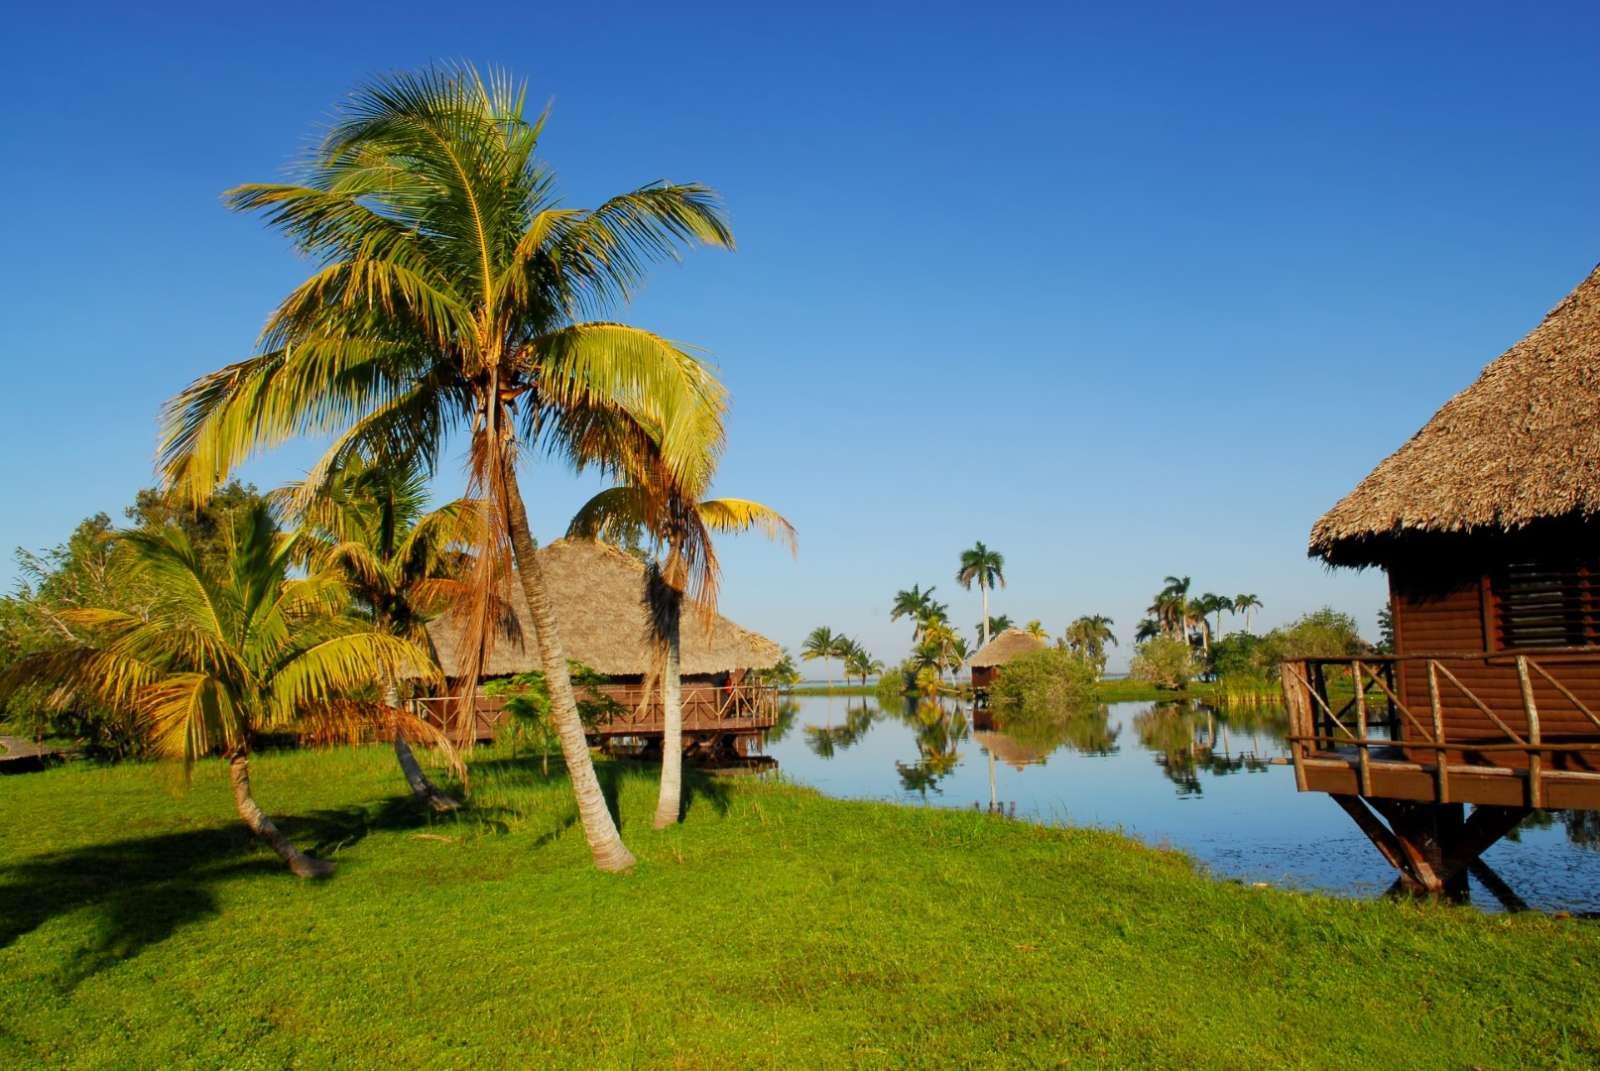 Cottages at Villa Guama resort and replica Taino village